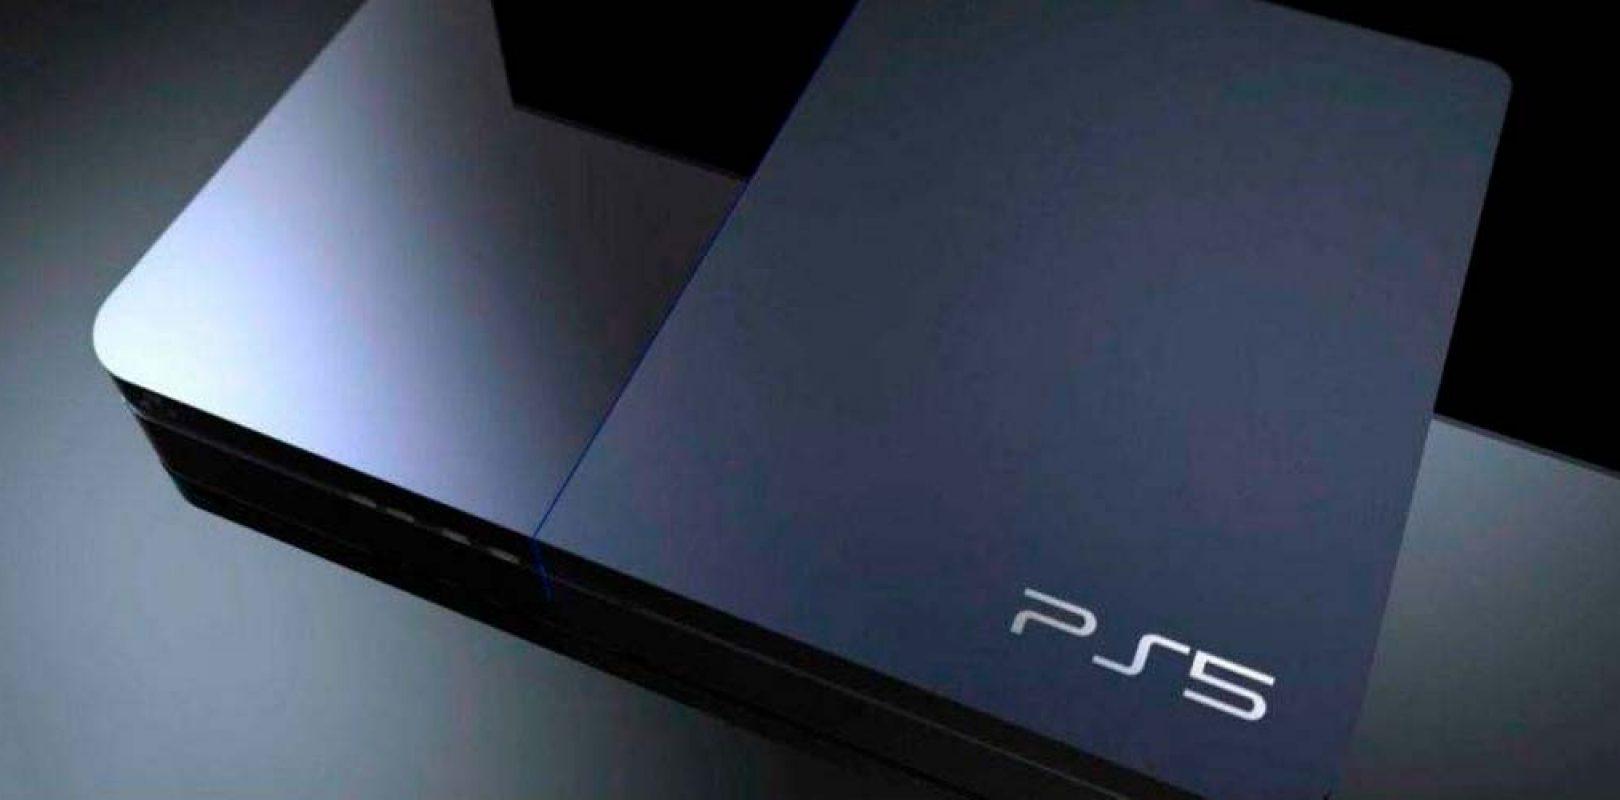 Prototipo de consola PS5.